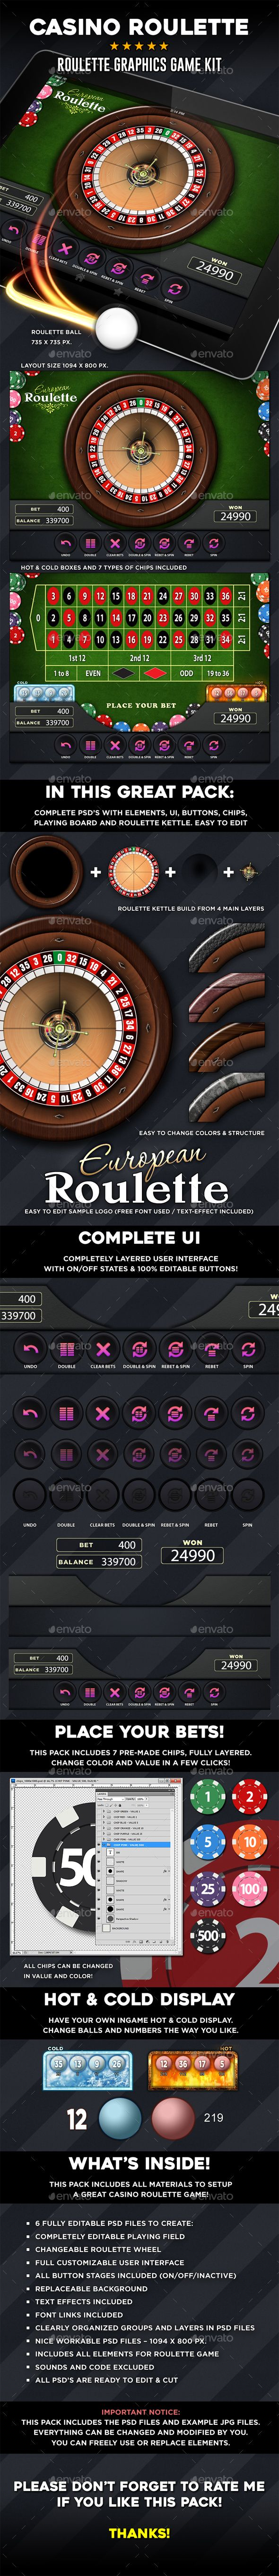 Wooden roulette buy black wooden roulette blackjack table led - Casino Roulette Graphics Game Kit